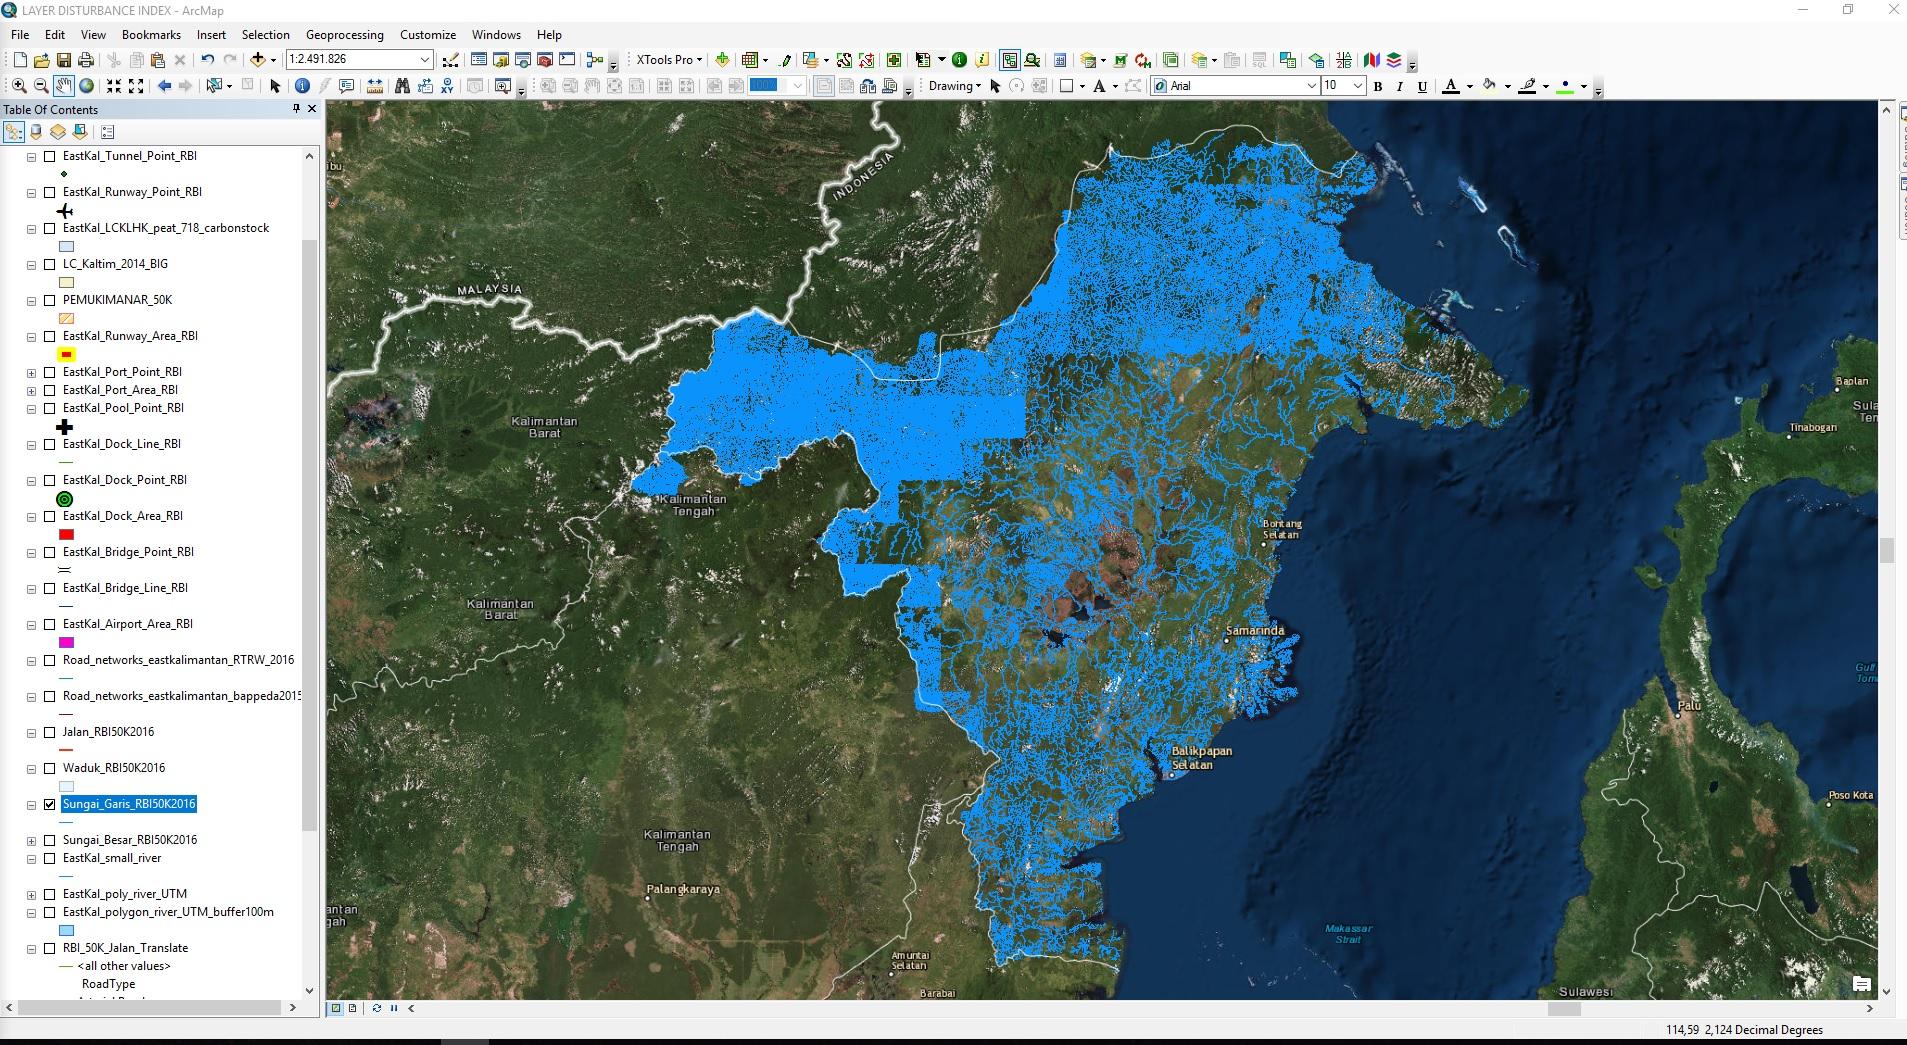 sungai_kaltim_inkonsistensi_data_antar_grid